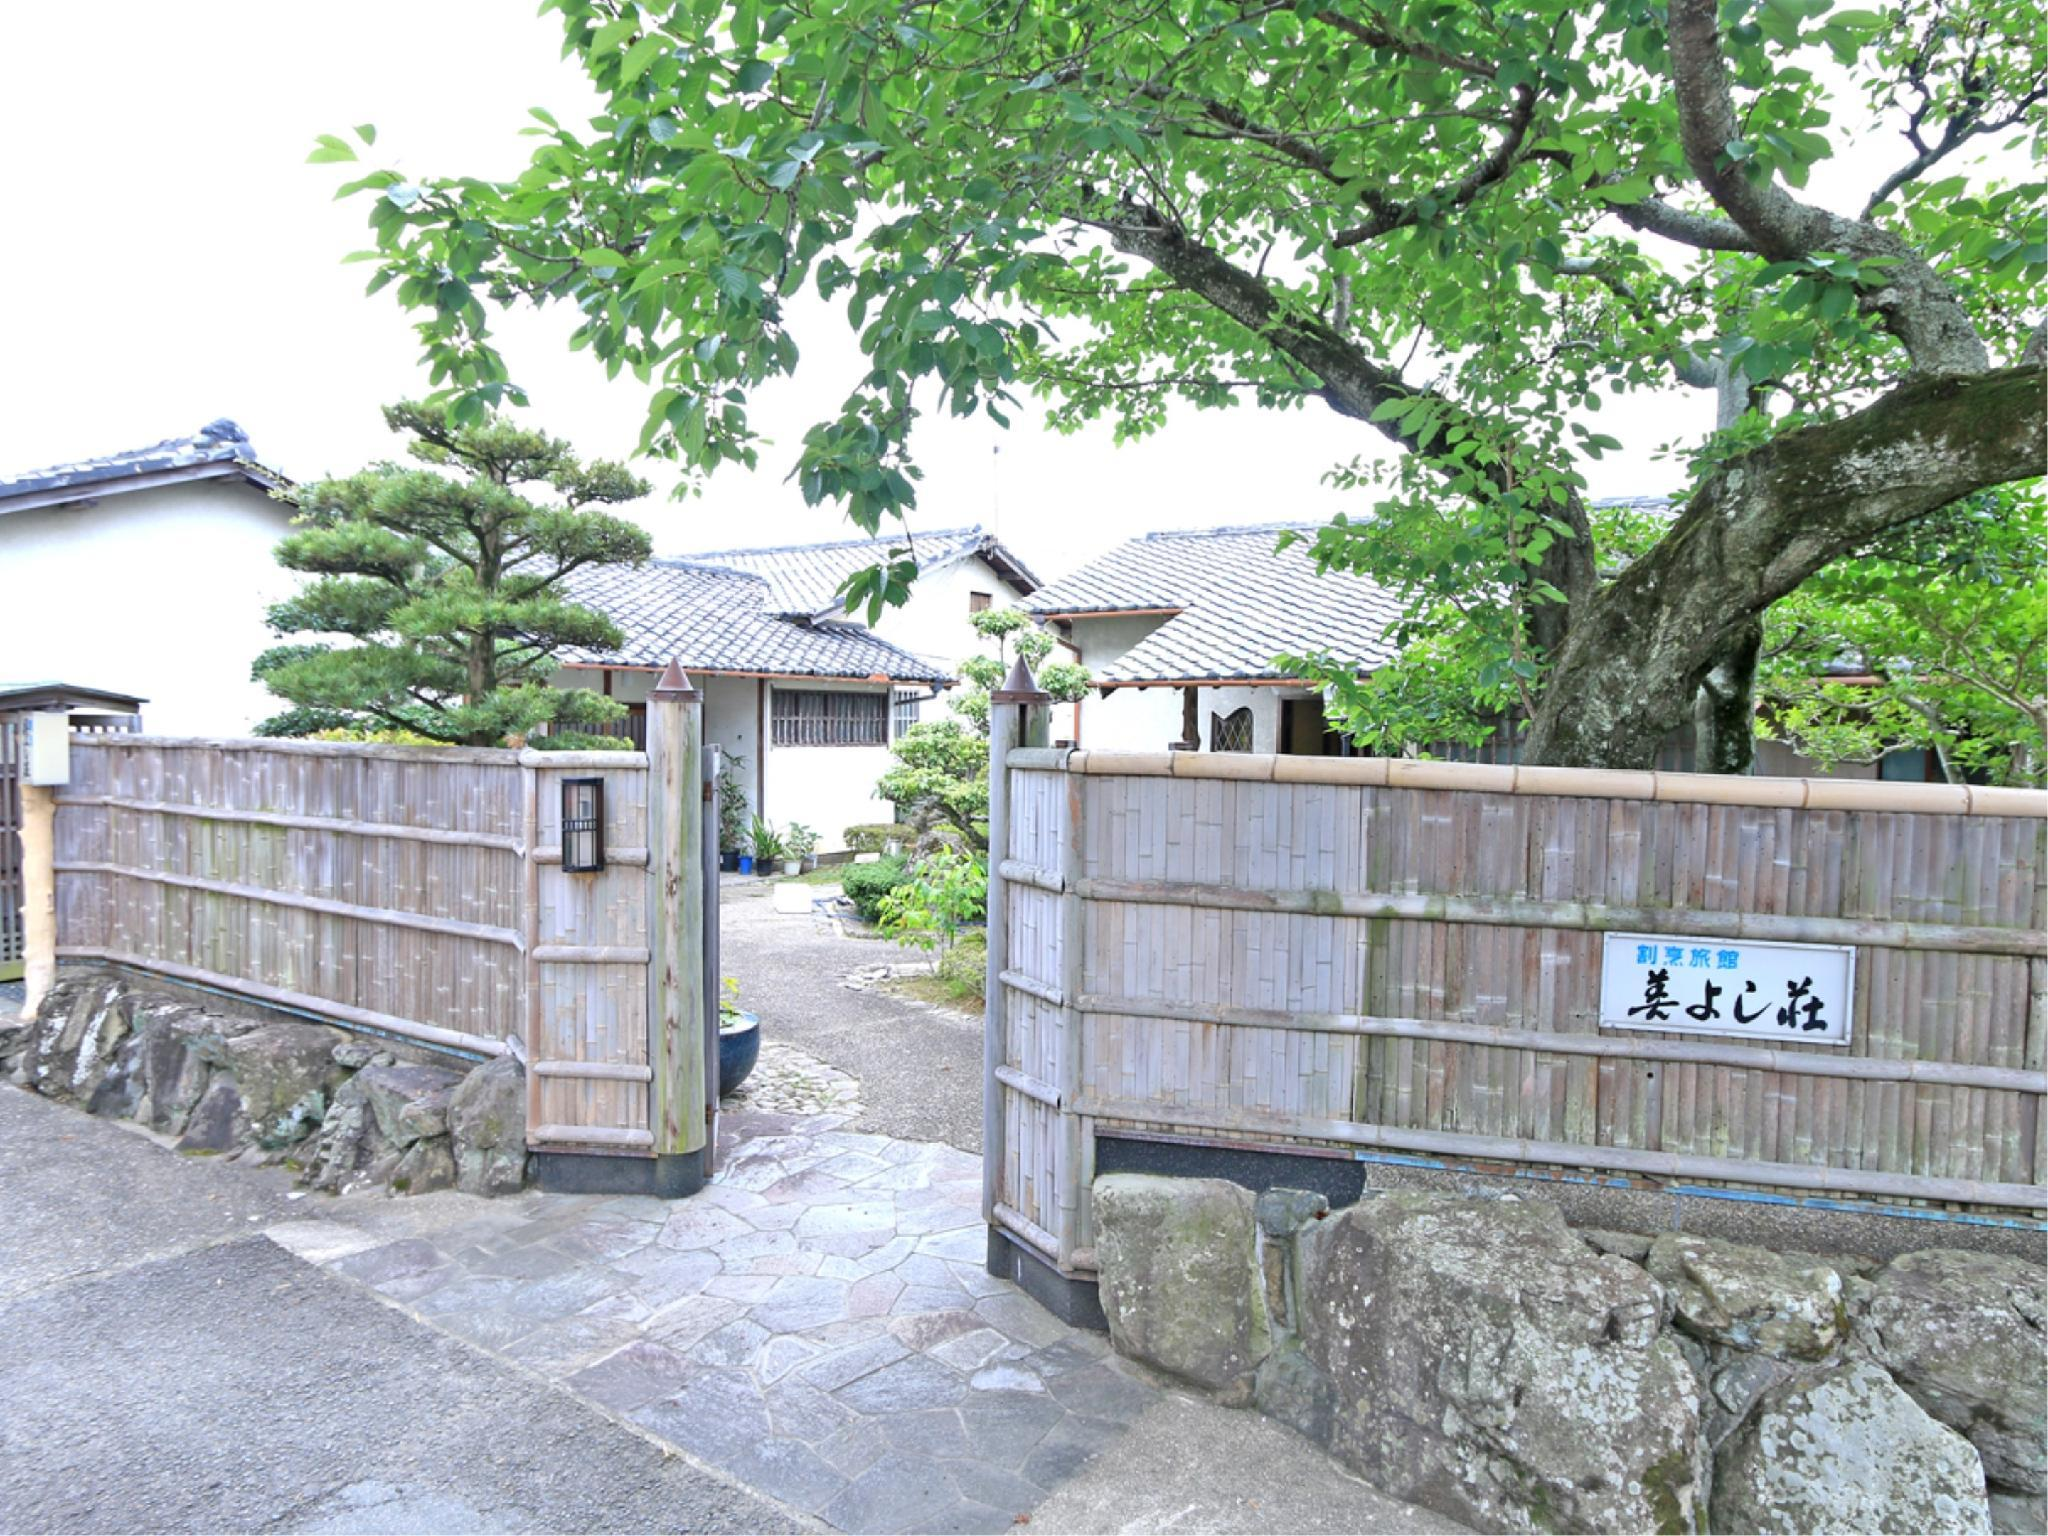 Kappou Ryokan Miyoshisou